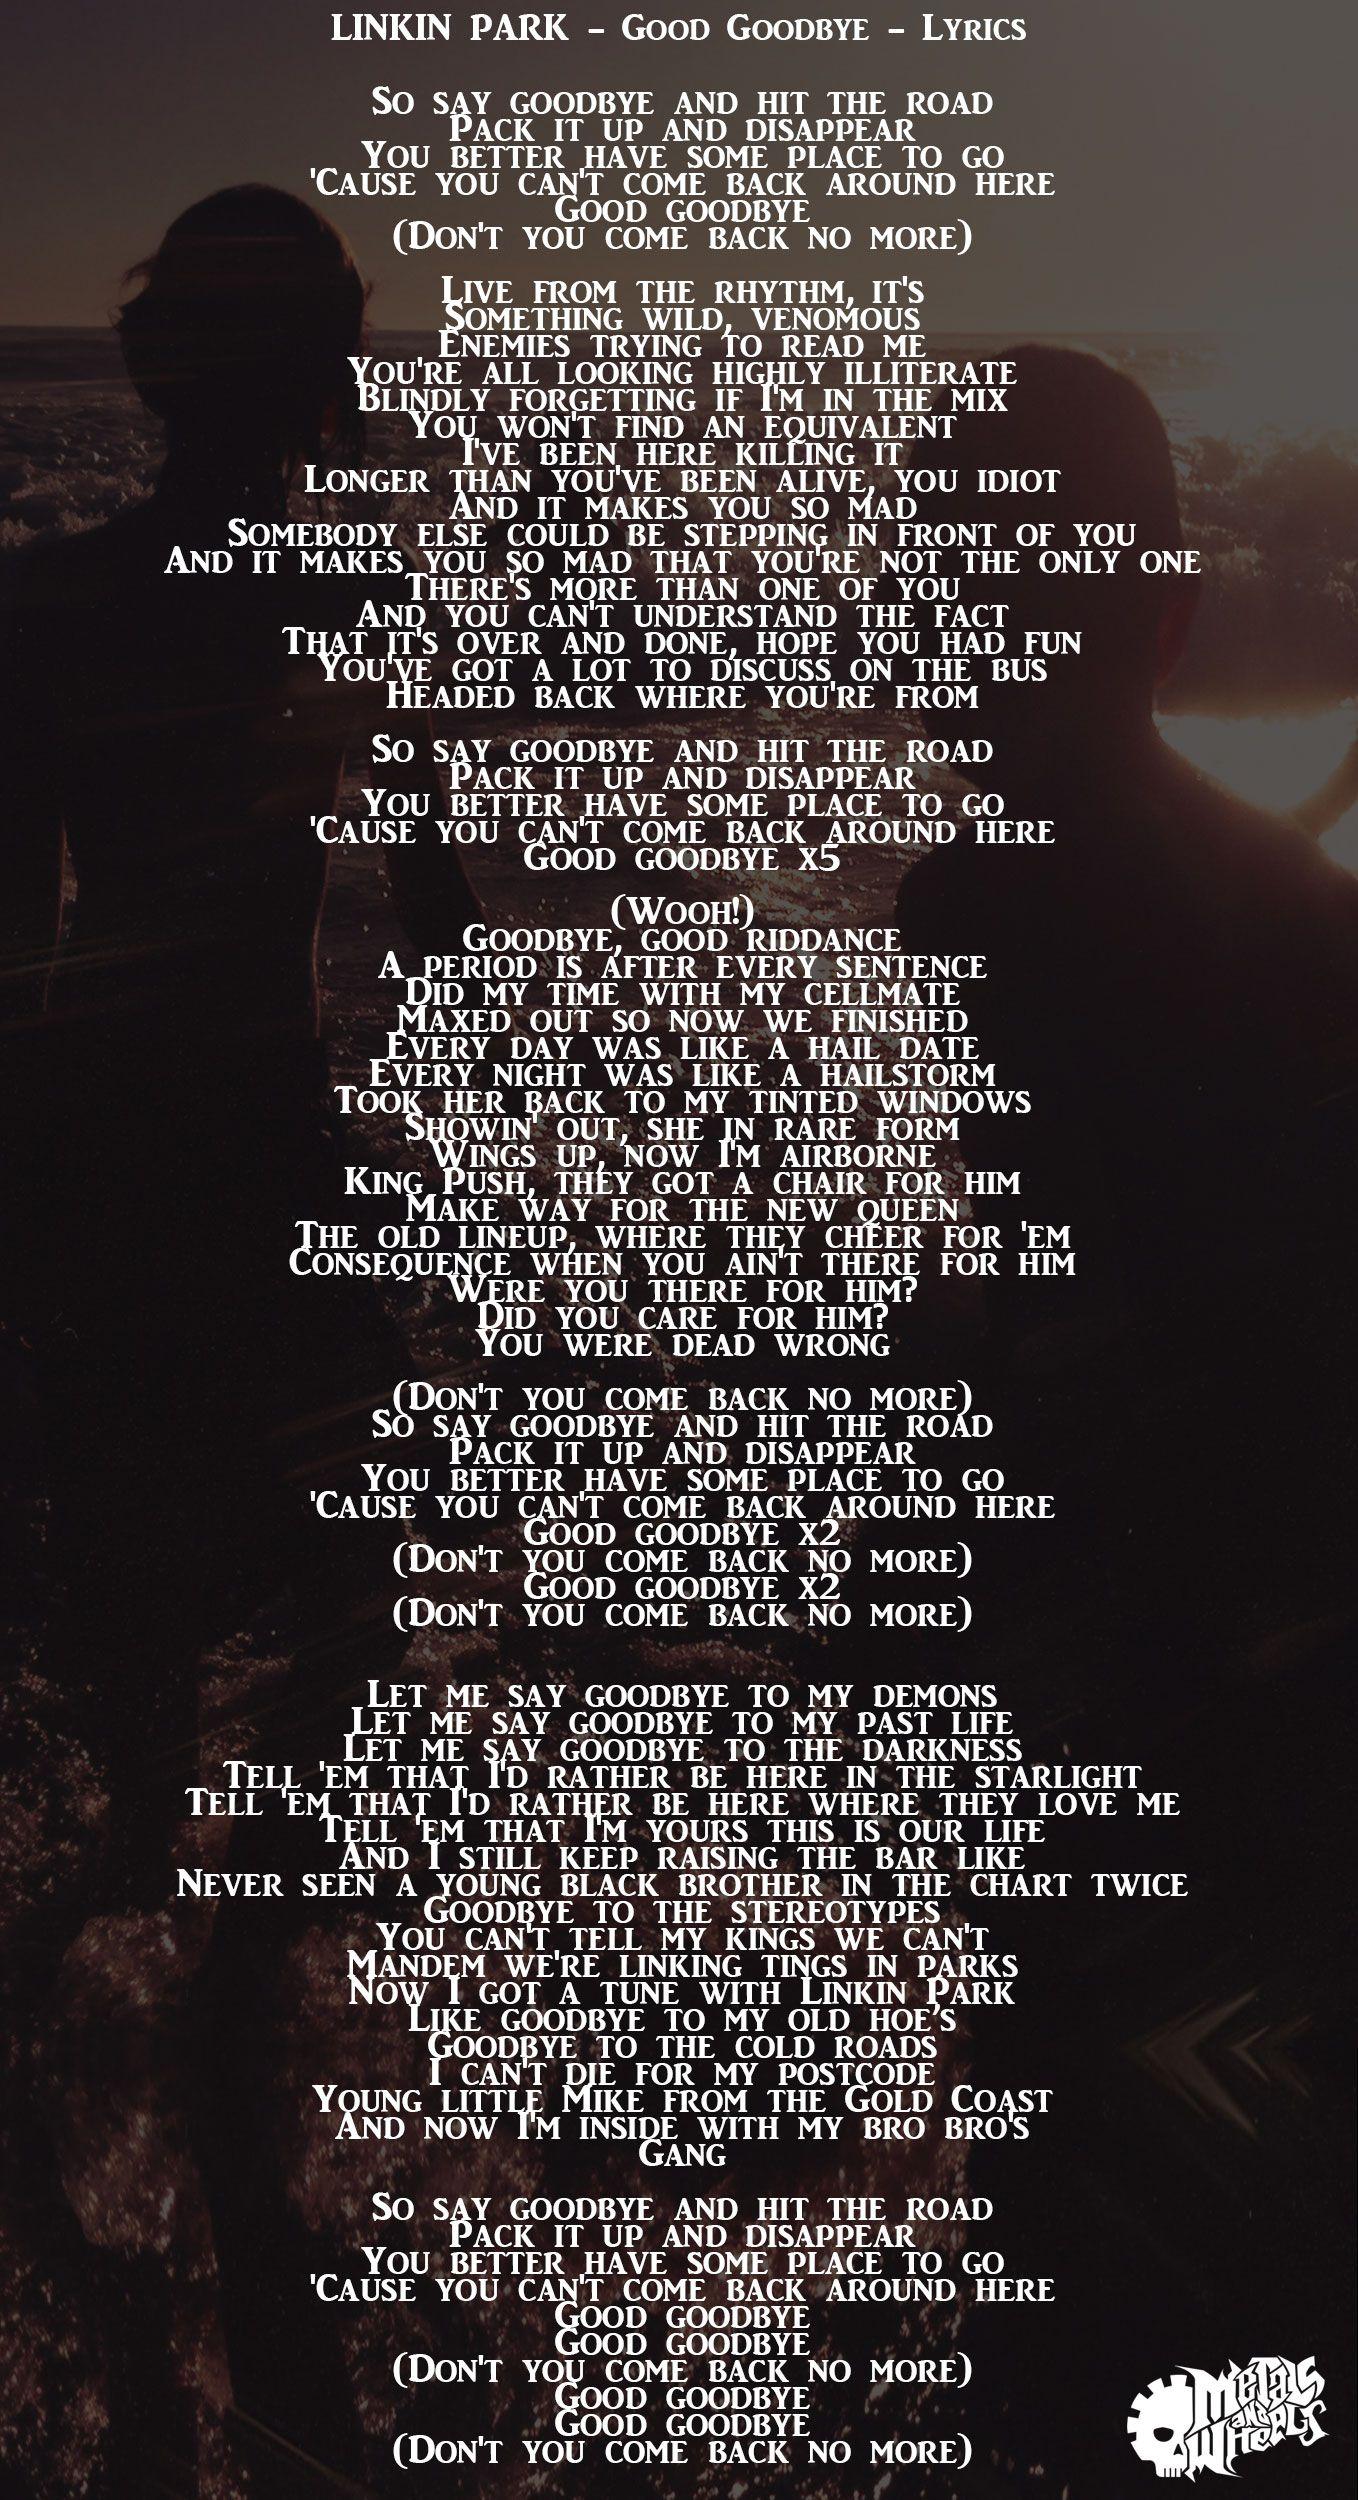 Good Goodbye - One More Light - Linkin park Lyrics | In